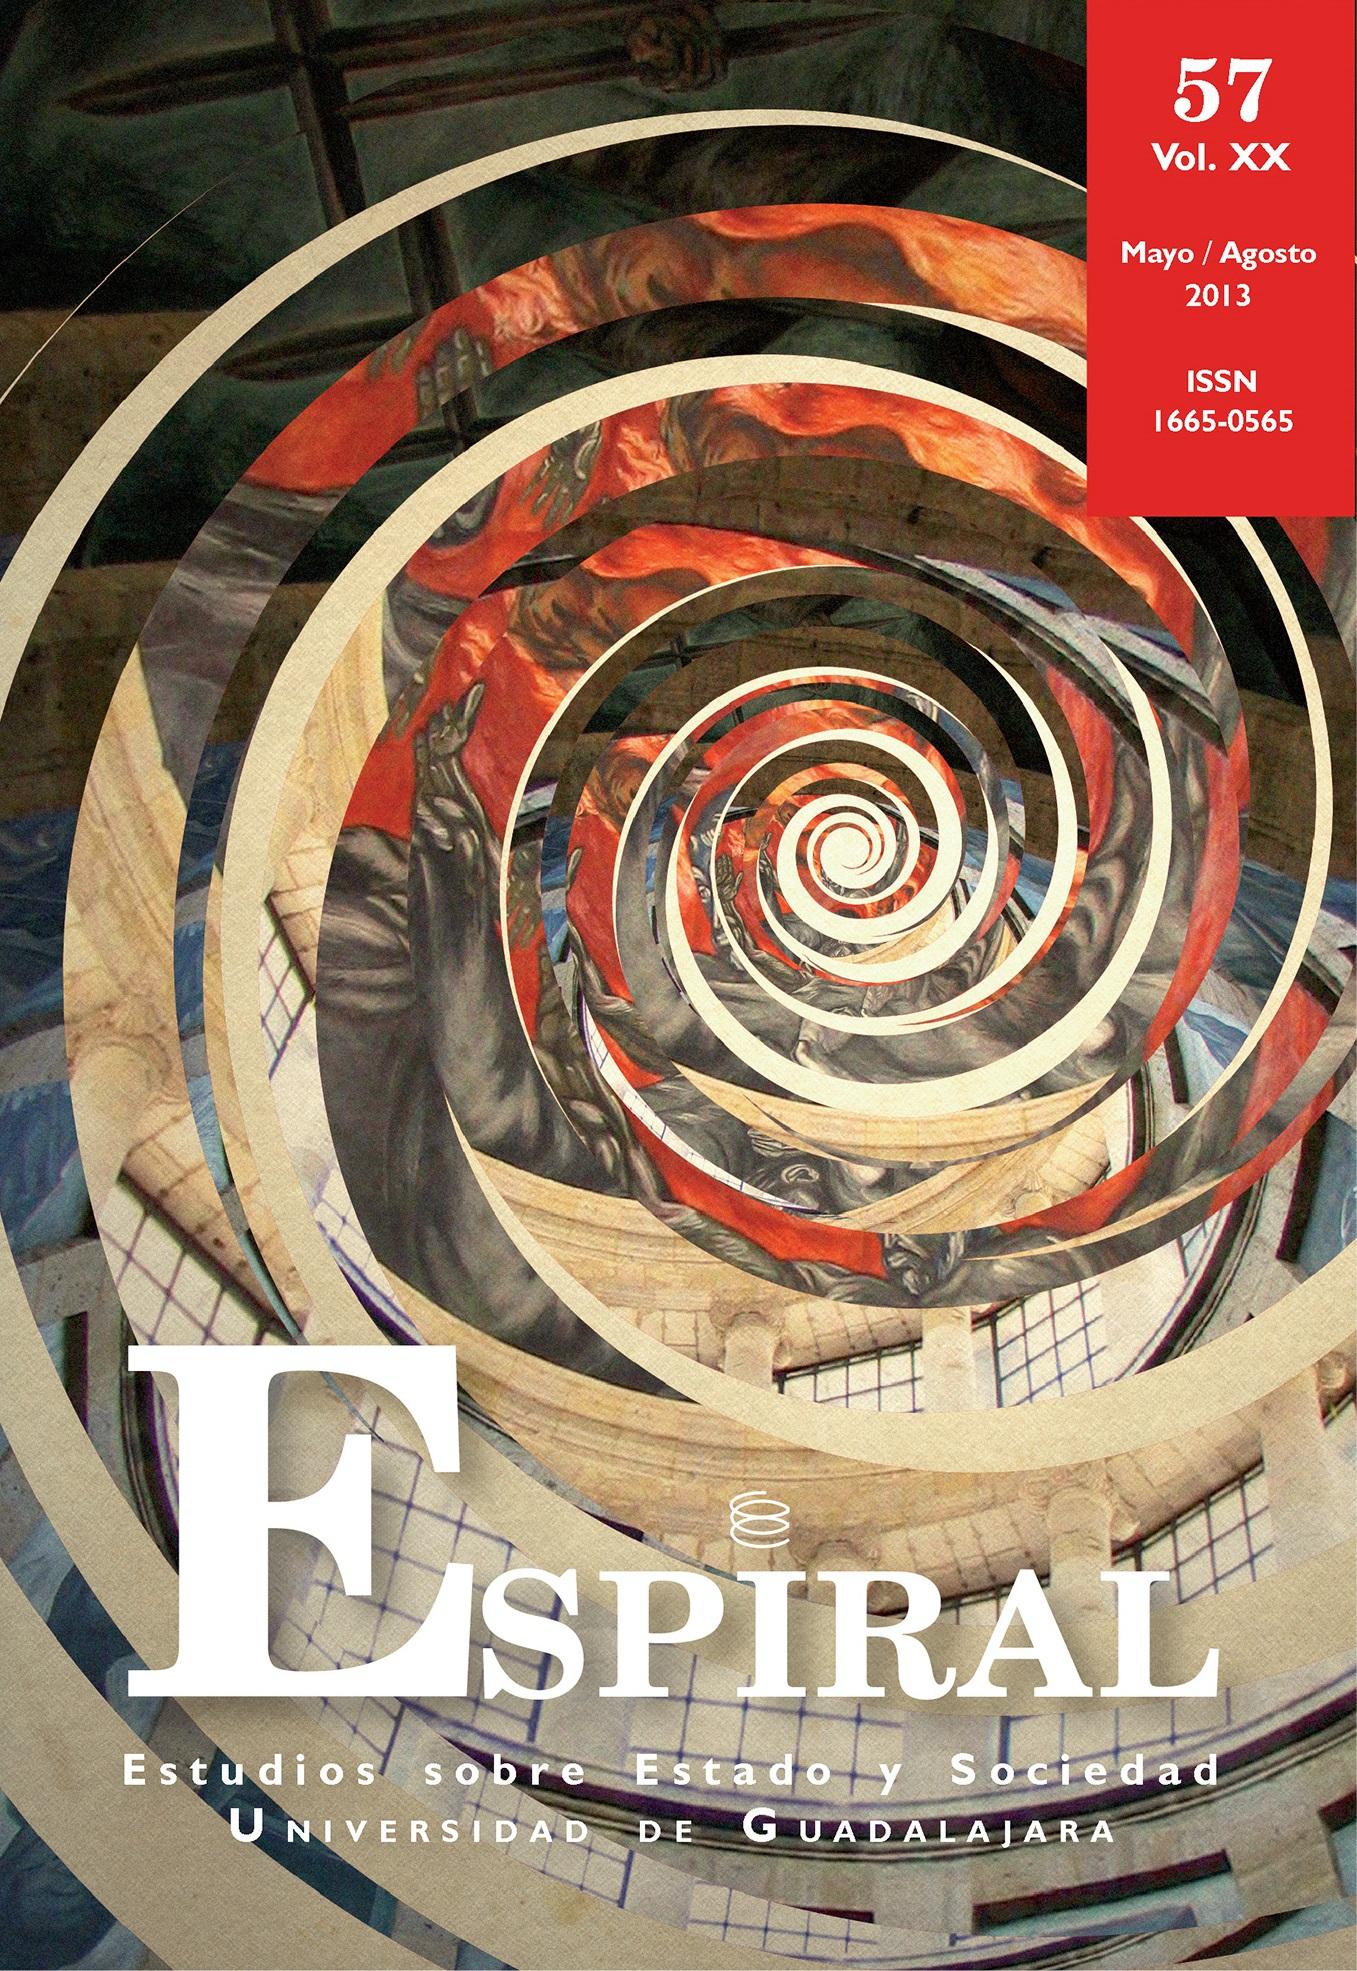 Ver Vol. 20 Núm. 57: Espiral 57 (mayo-agosto 2013)